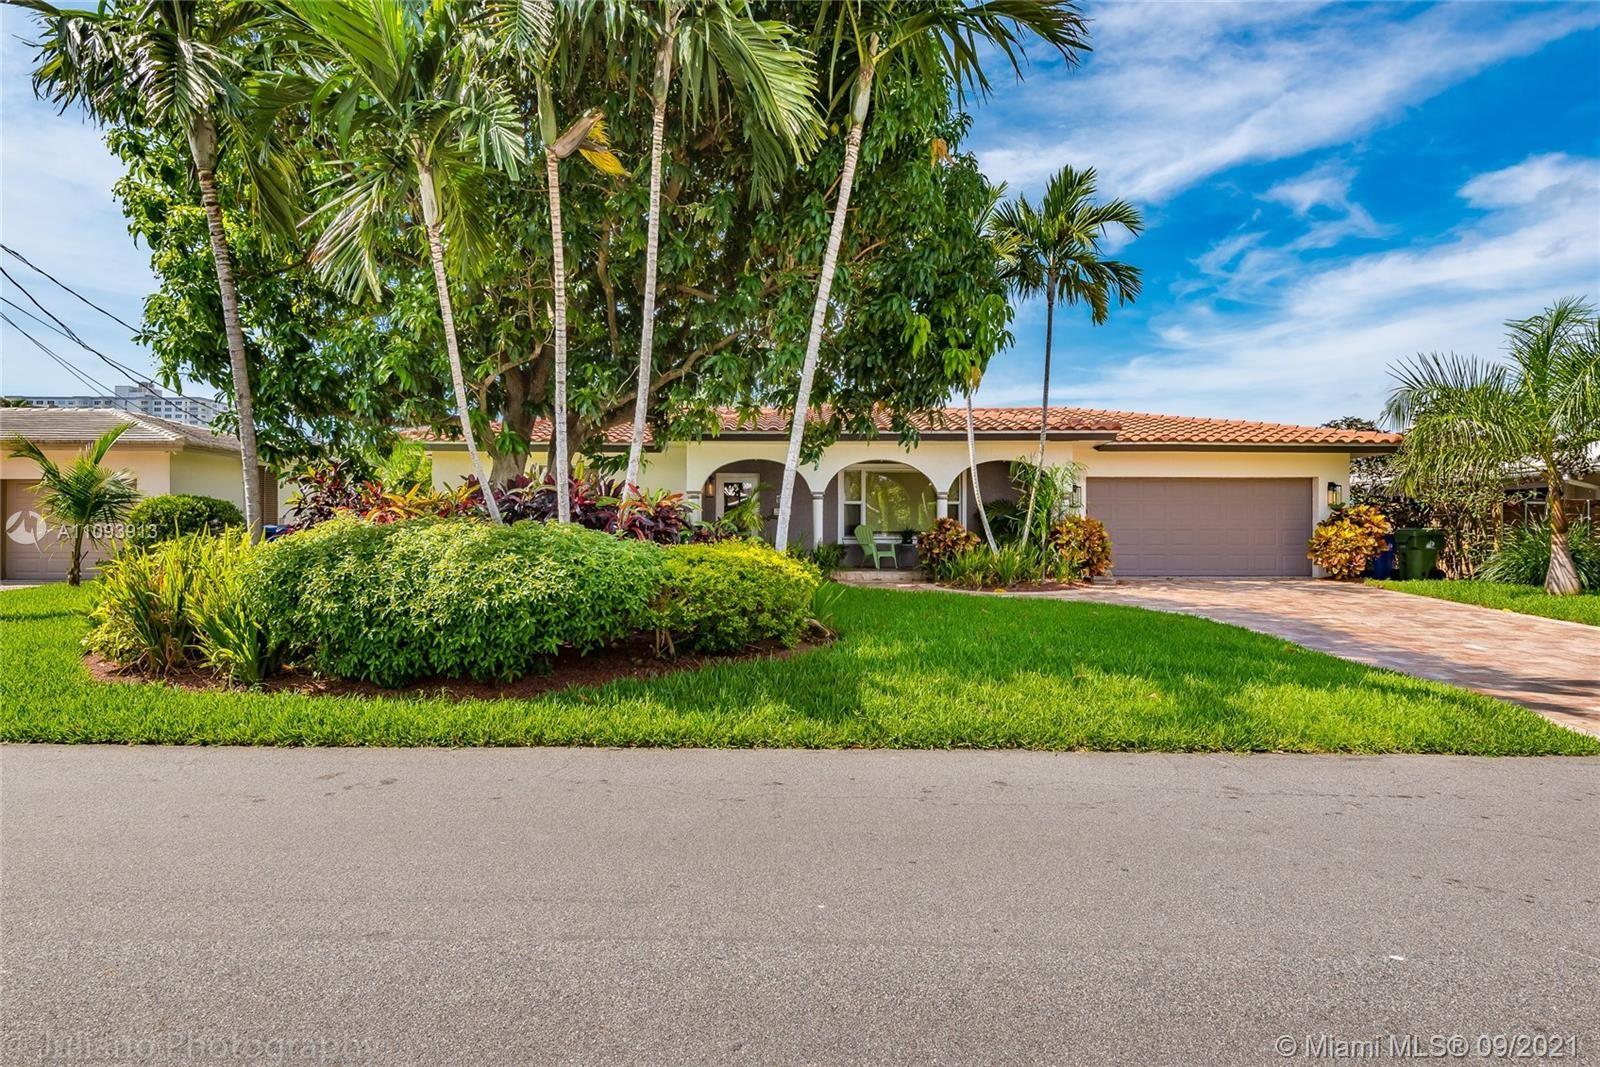 3300 NE 40th Ct, Fort Lauderdale, FL 33308 - #: A11093913